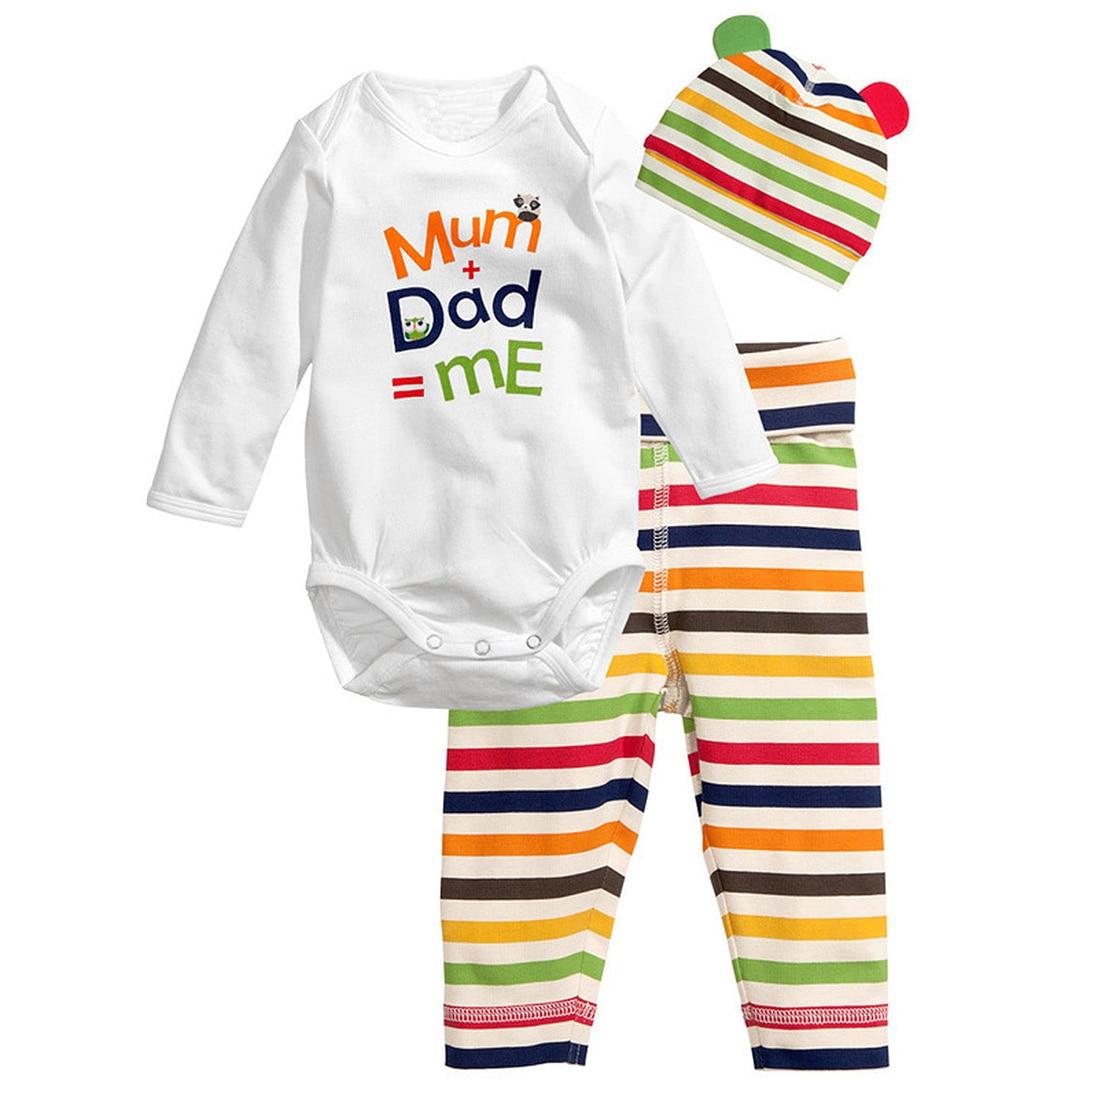 KEOL Best Sale 3pcs Baby Boys Girls Kids Newborn Hat+Romper+Pants Trousers Outfit Clothing Set Colour:Colourful Size:80(6-12 M